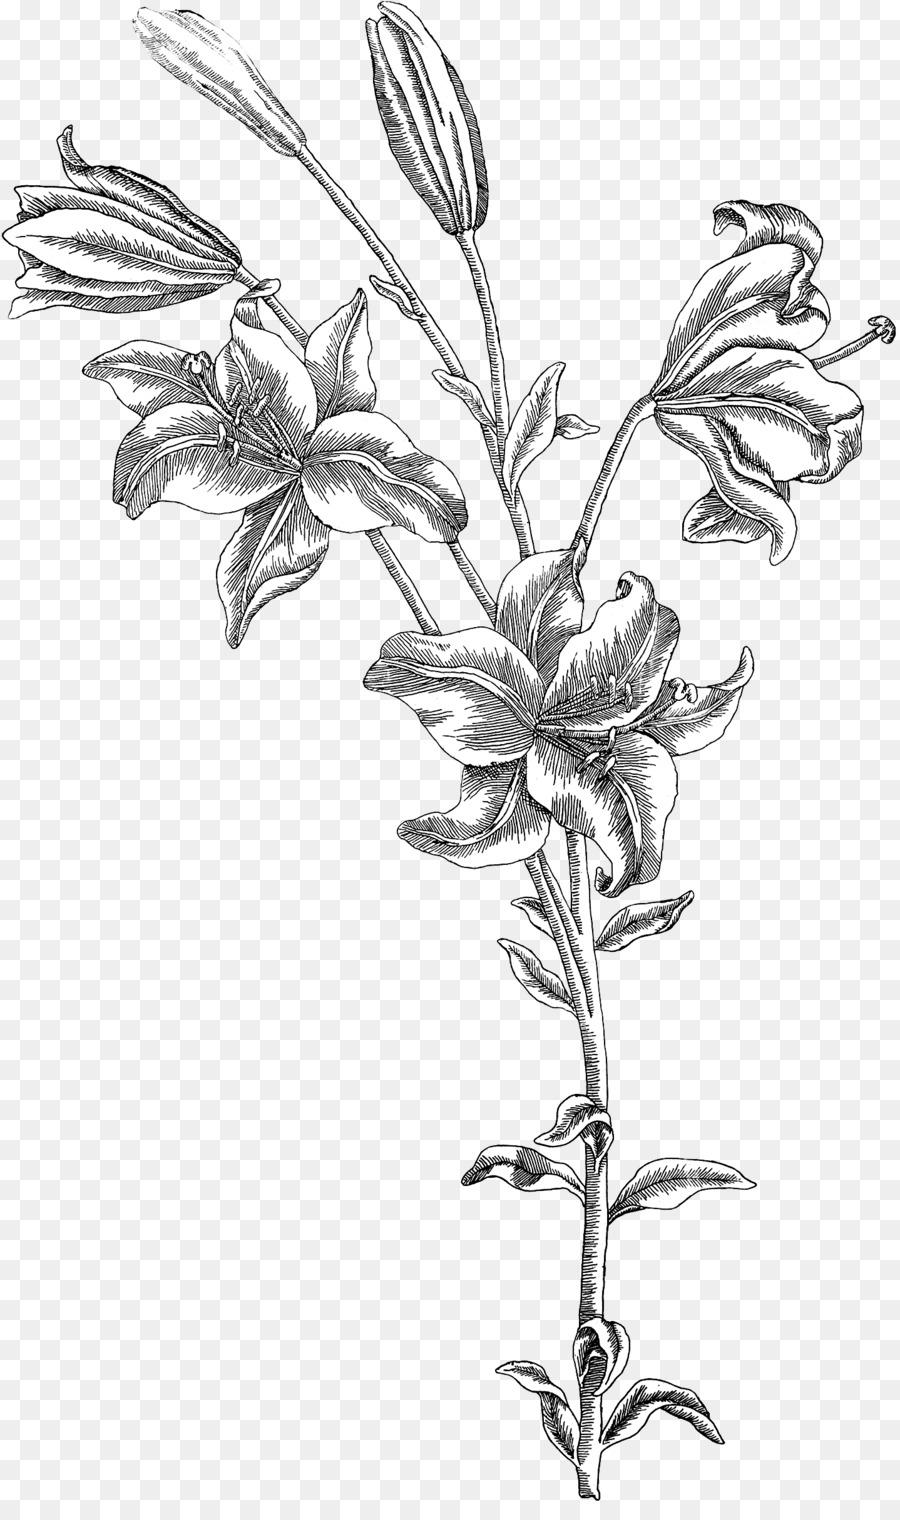 12 leaf flower clipart black and white free Black And White Flower clipart - Leaf, Botany, Drawing, transparent ... free